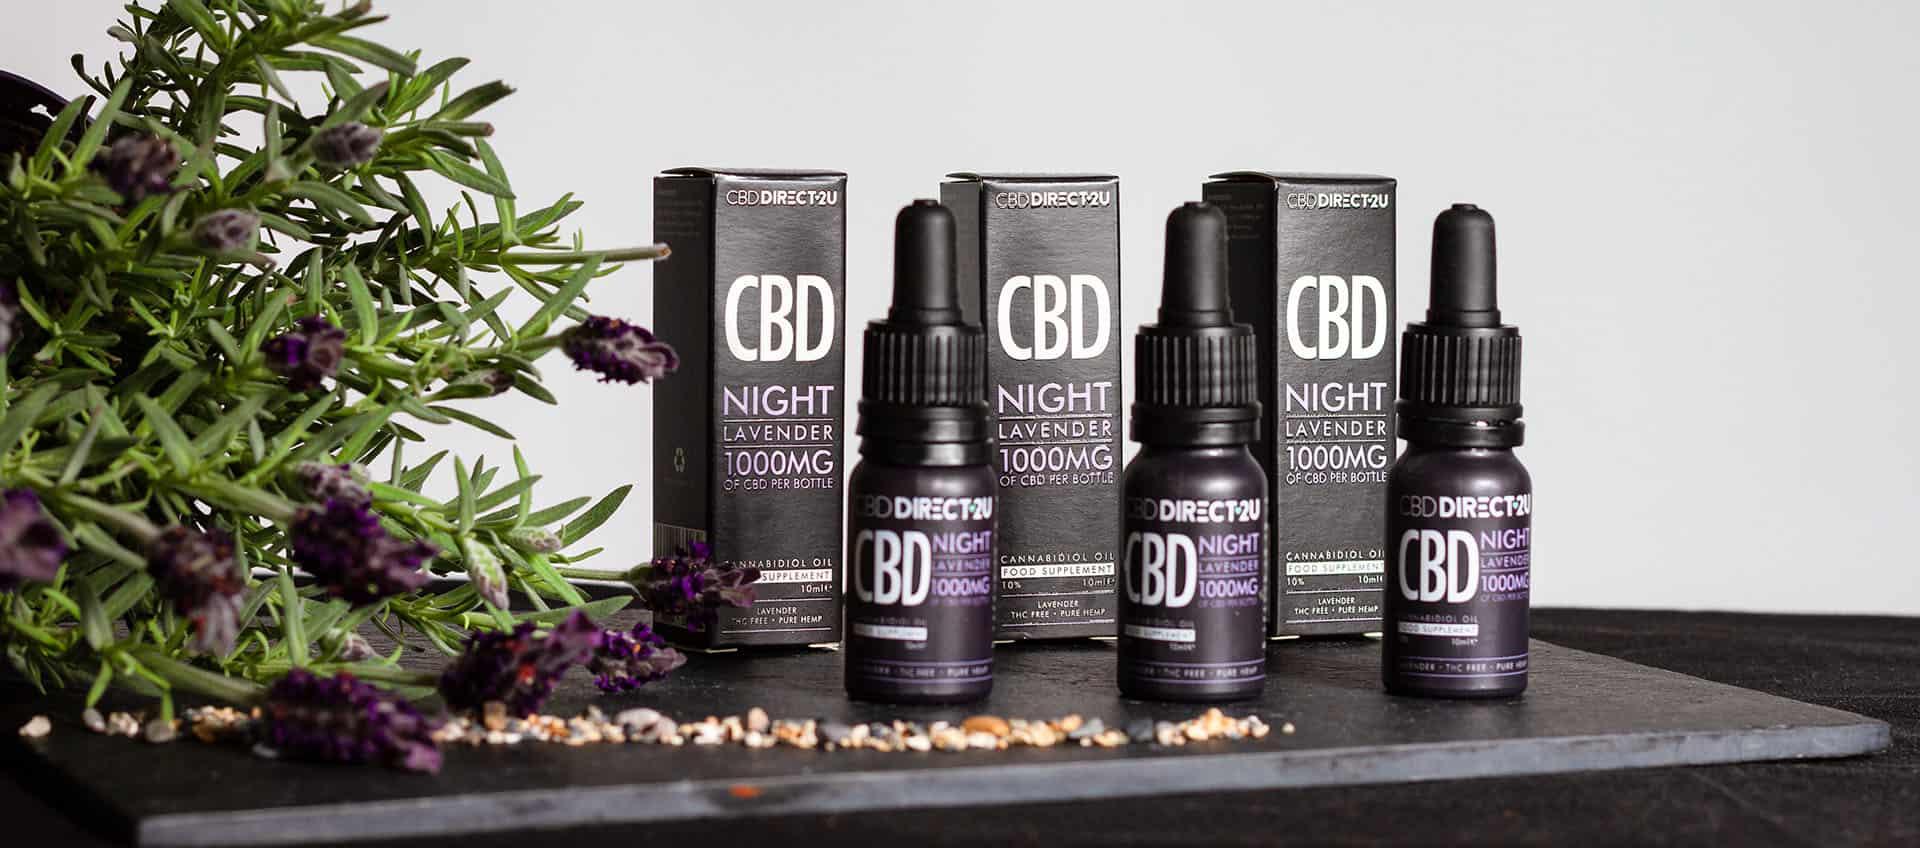 CBDDIRECT2U CBD With Lavender Flavours